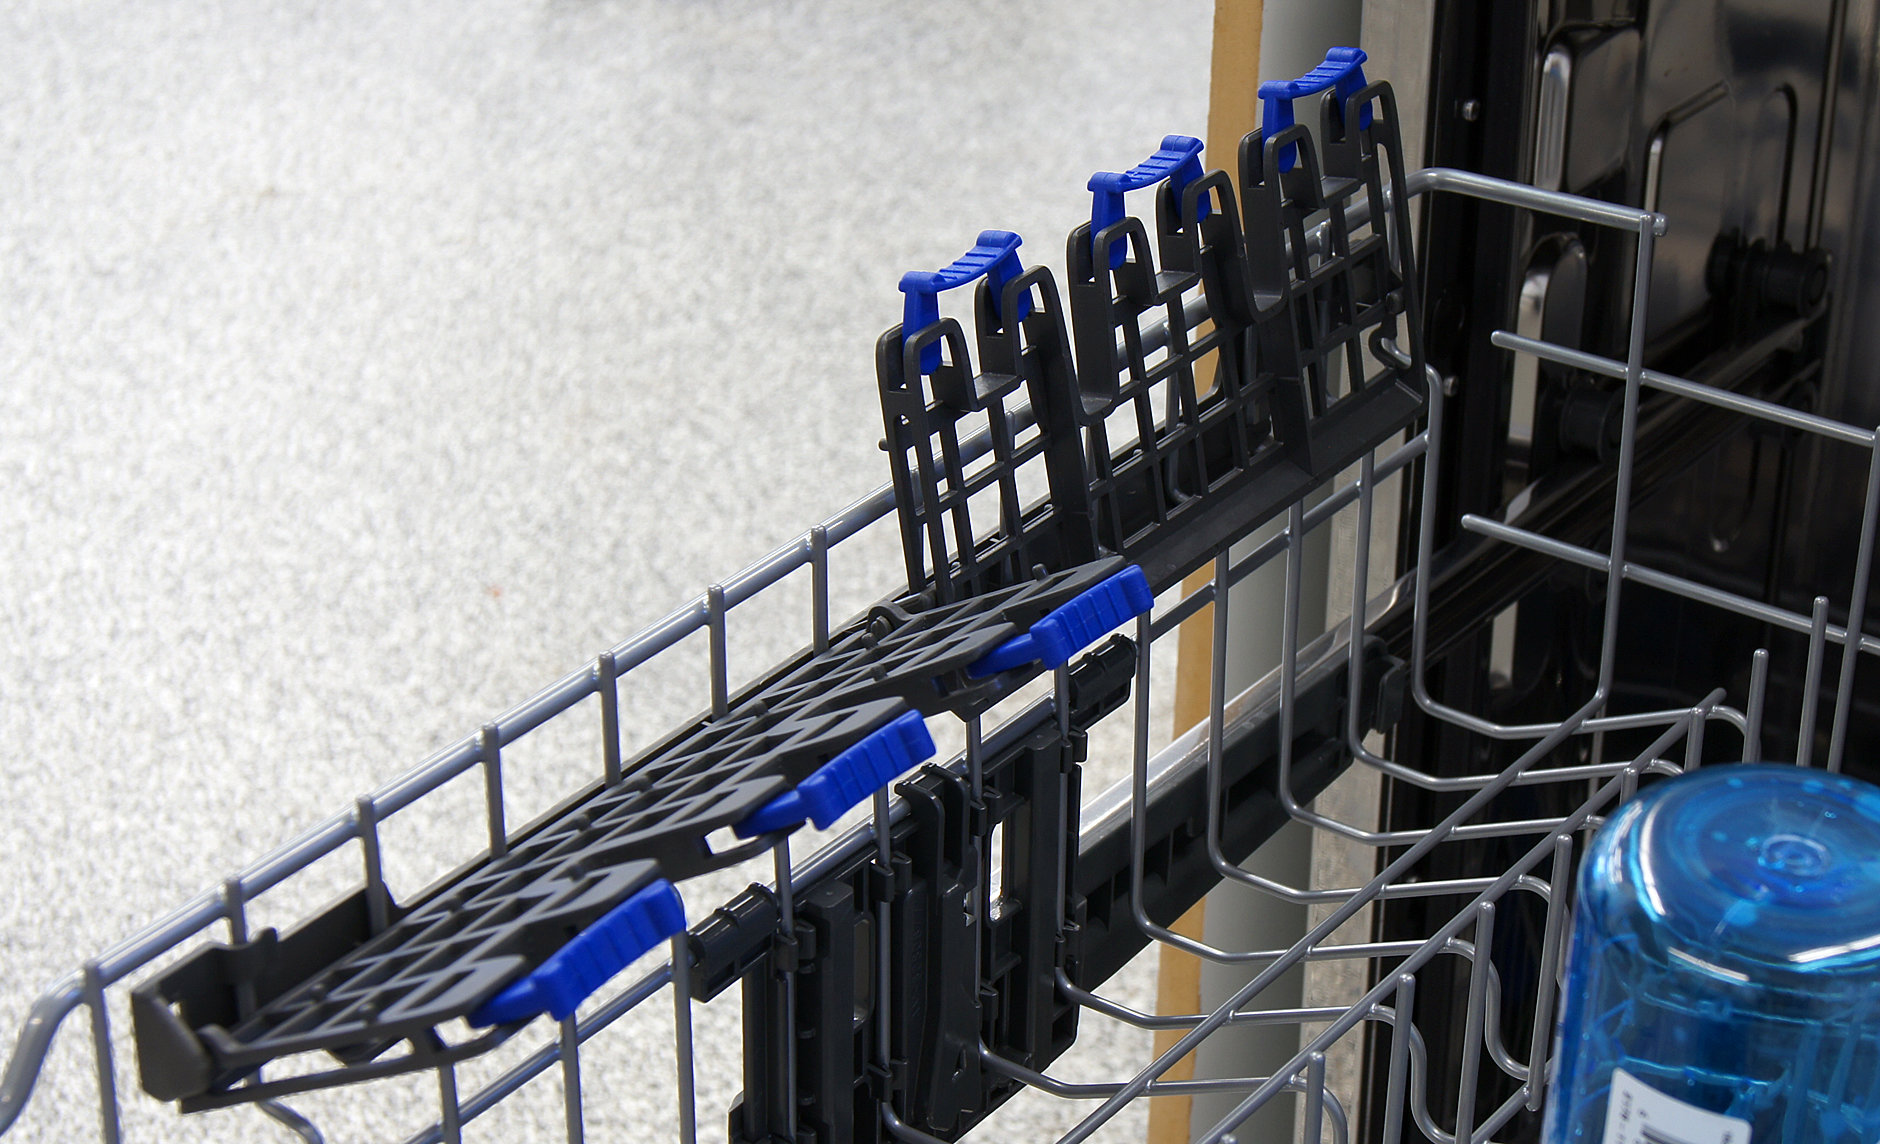 Electrolux EI24ID30QS stemware clips